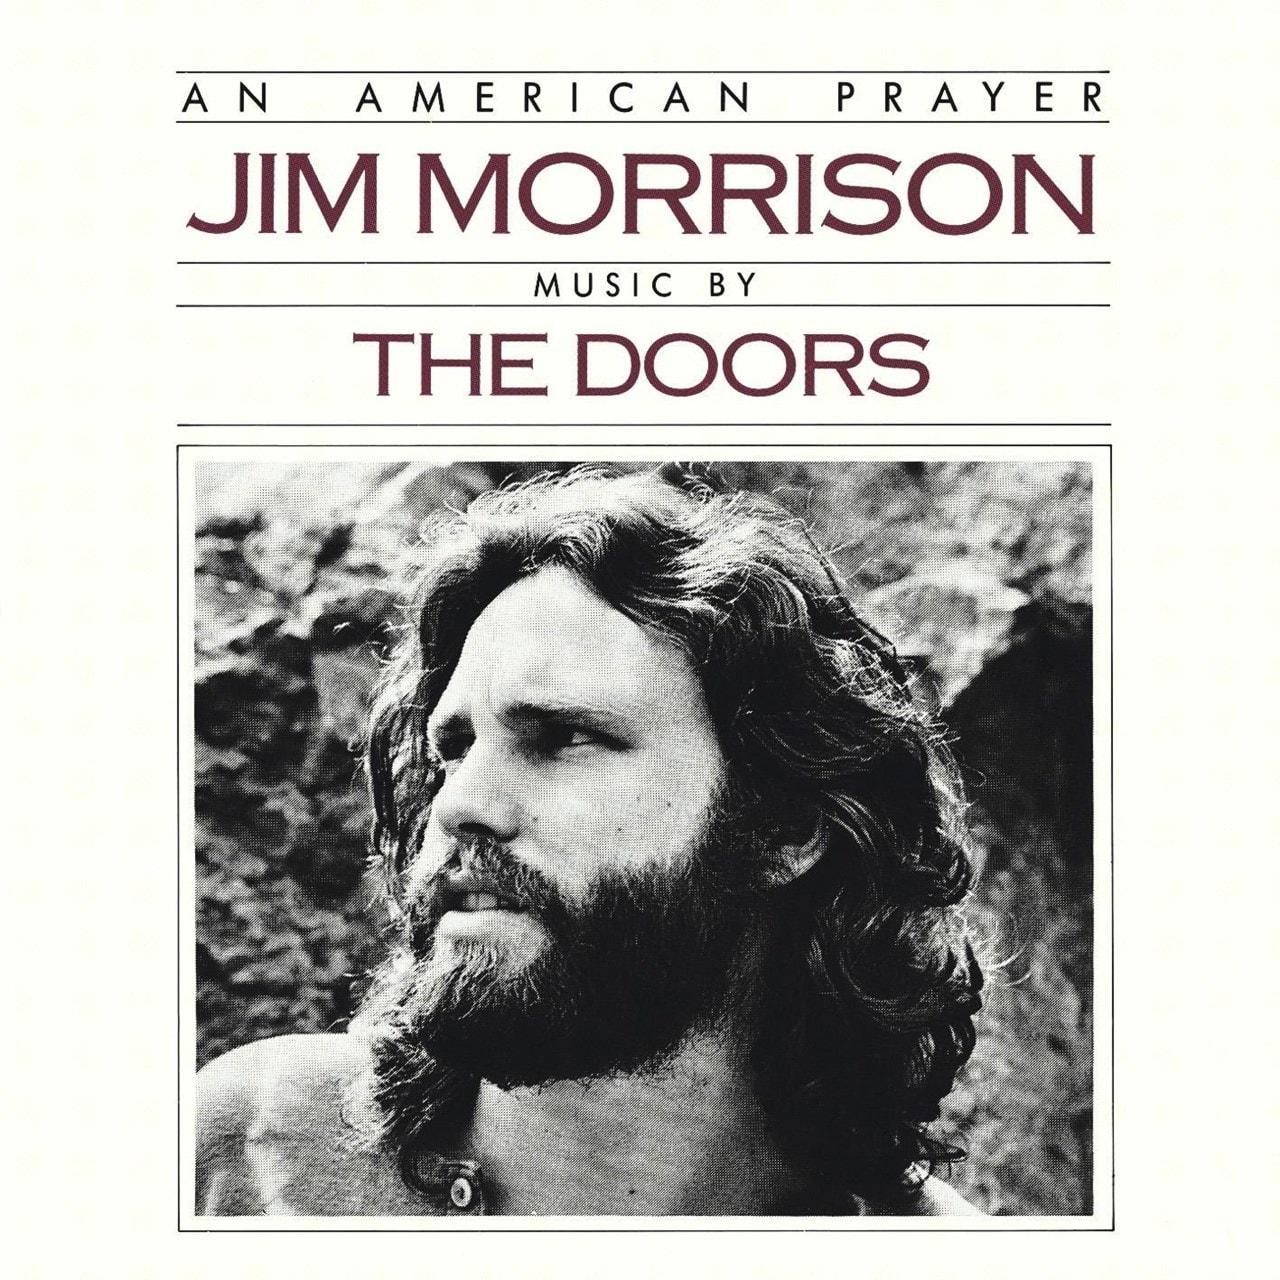 An American Prayer: Music By the Doors - 1